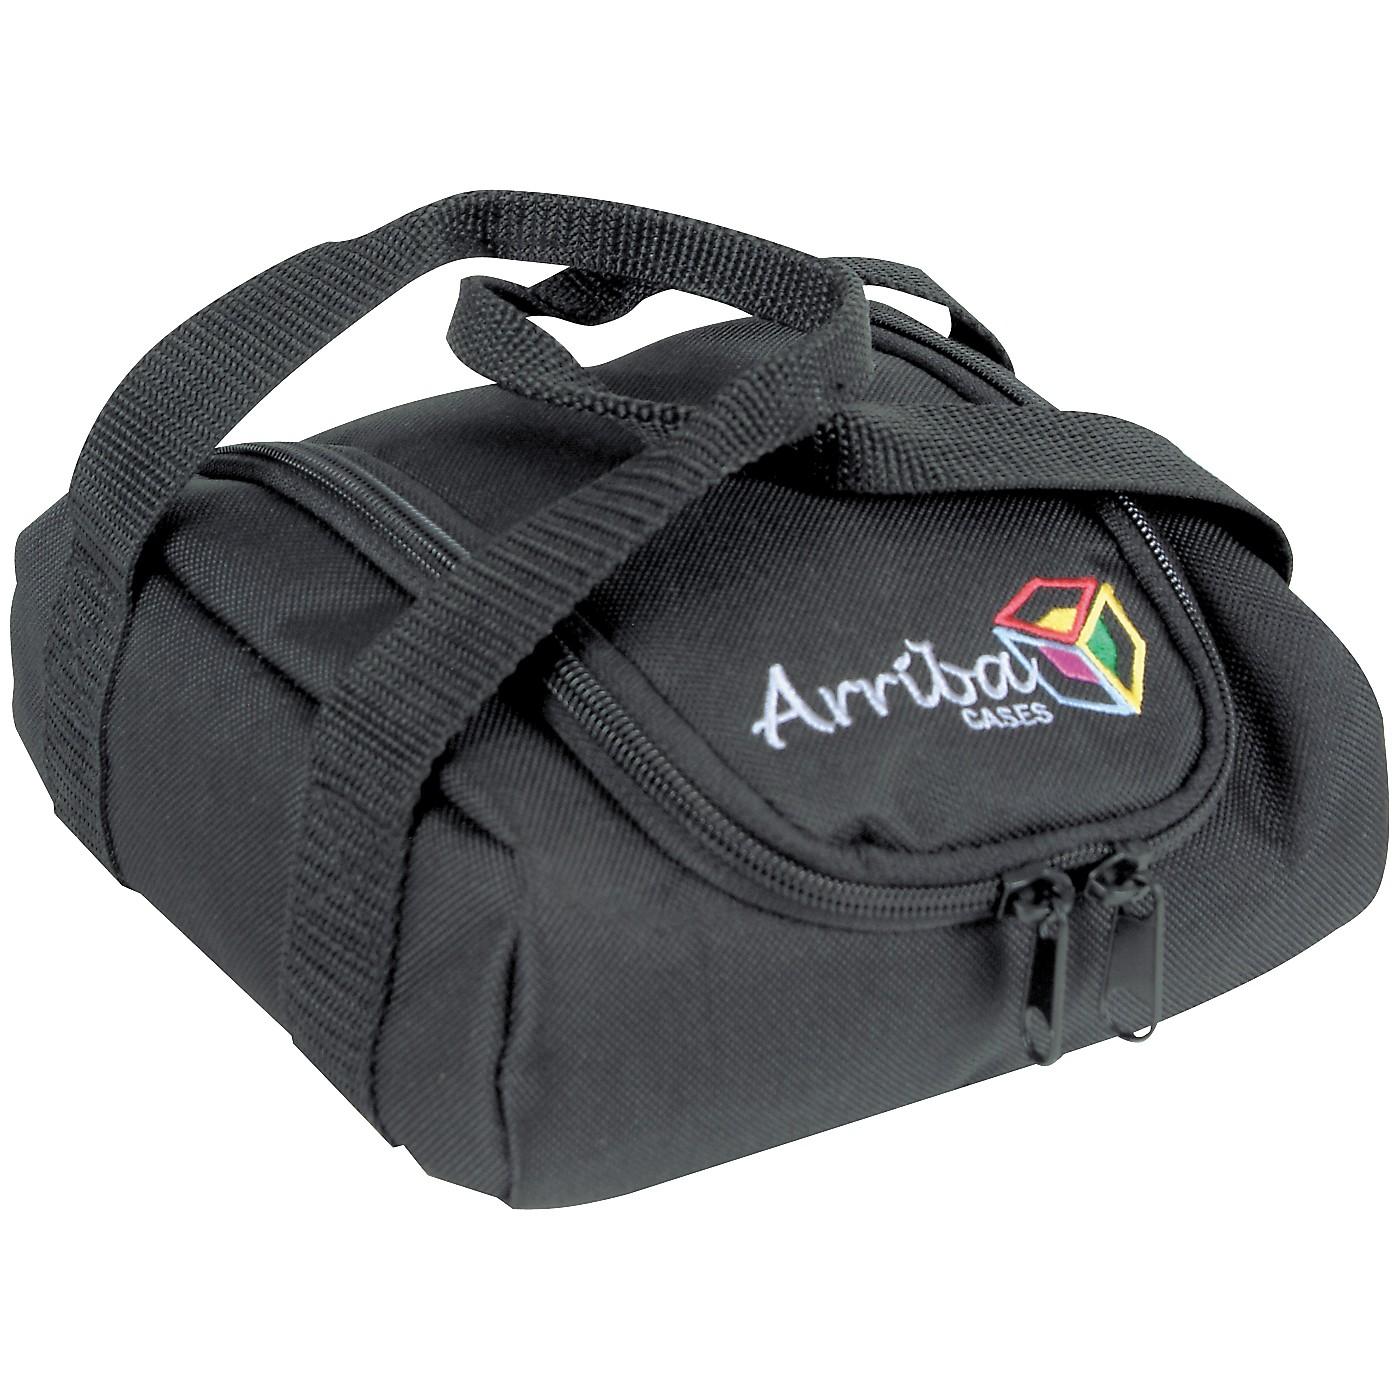 Arriba Cases AC-50 Mini Lighting Accessory Bag thumbnail